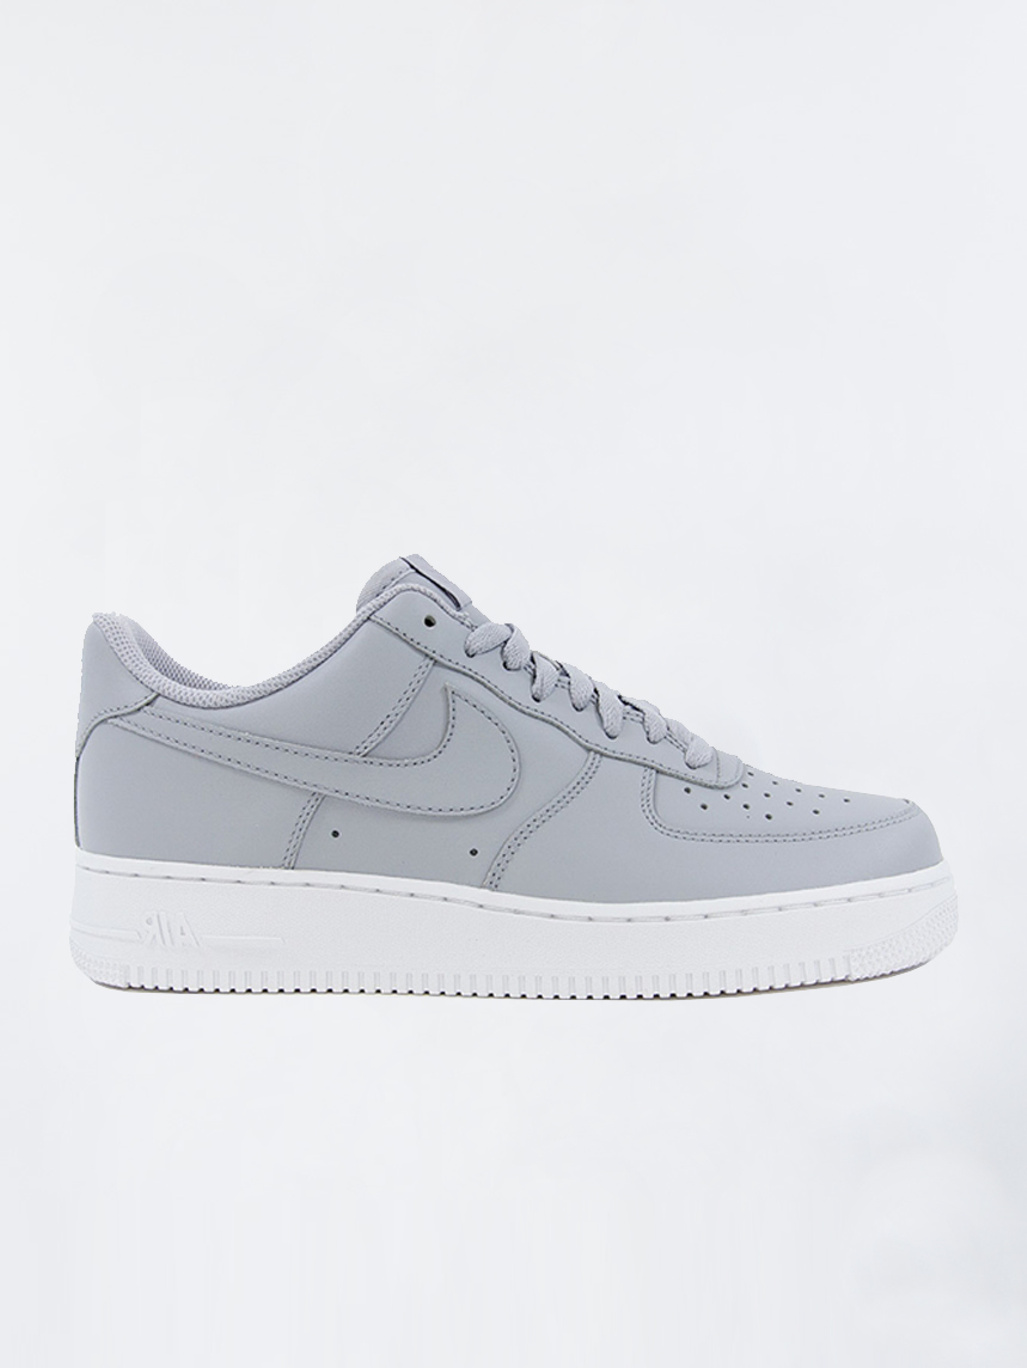 buy online 5cf05 833e8 Nike Air Force 1  07 Wolf Grey